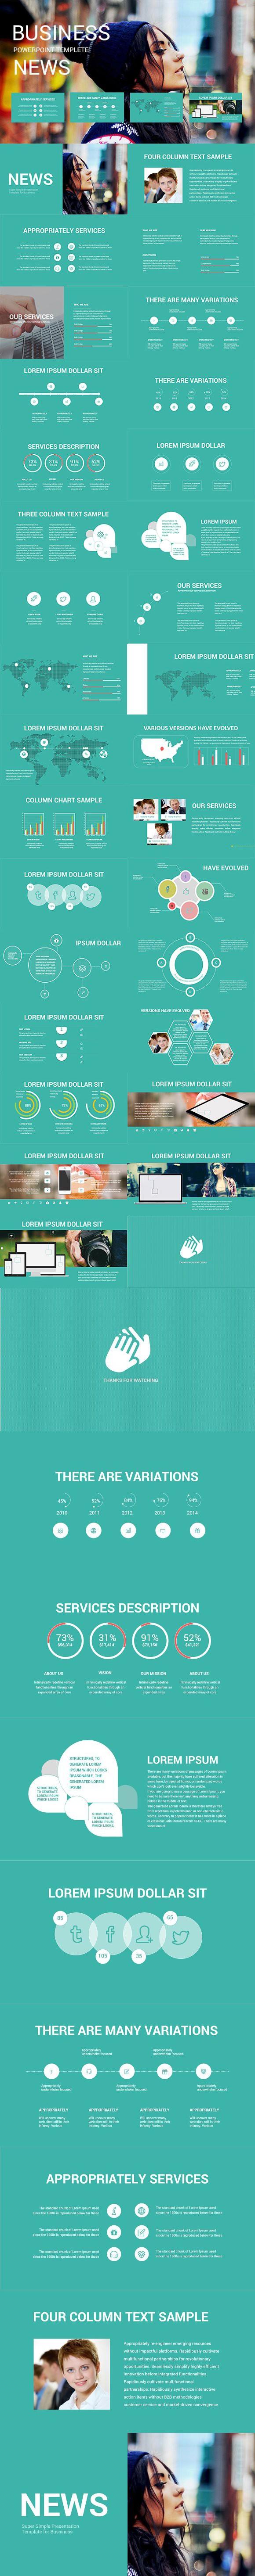 news presentation template . presentation templates   presentation, Presentation templates